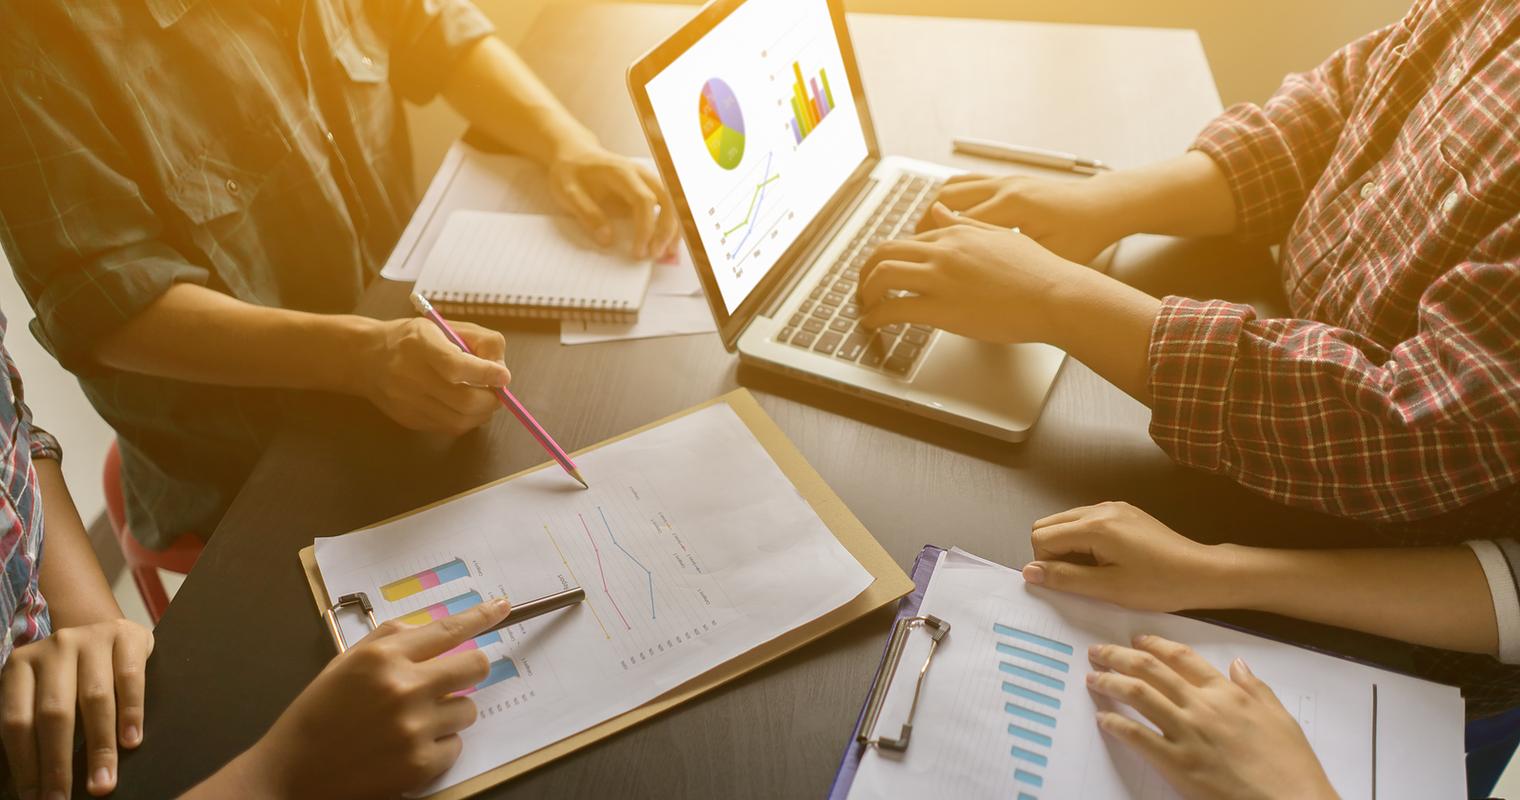 20 Essential Skills for Digital Marketers